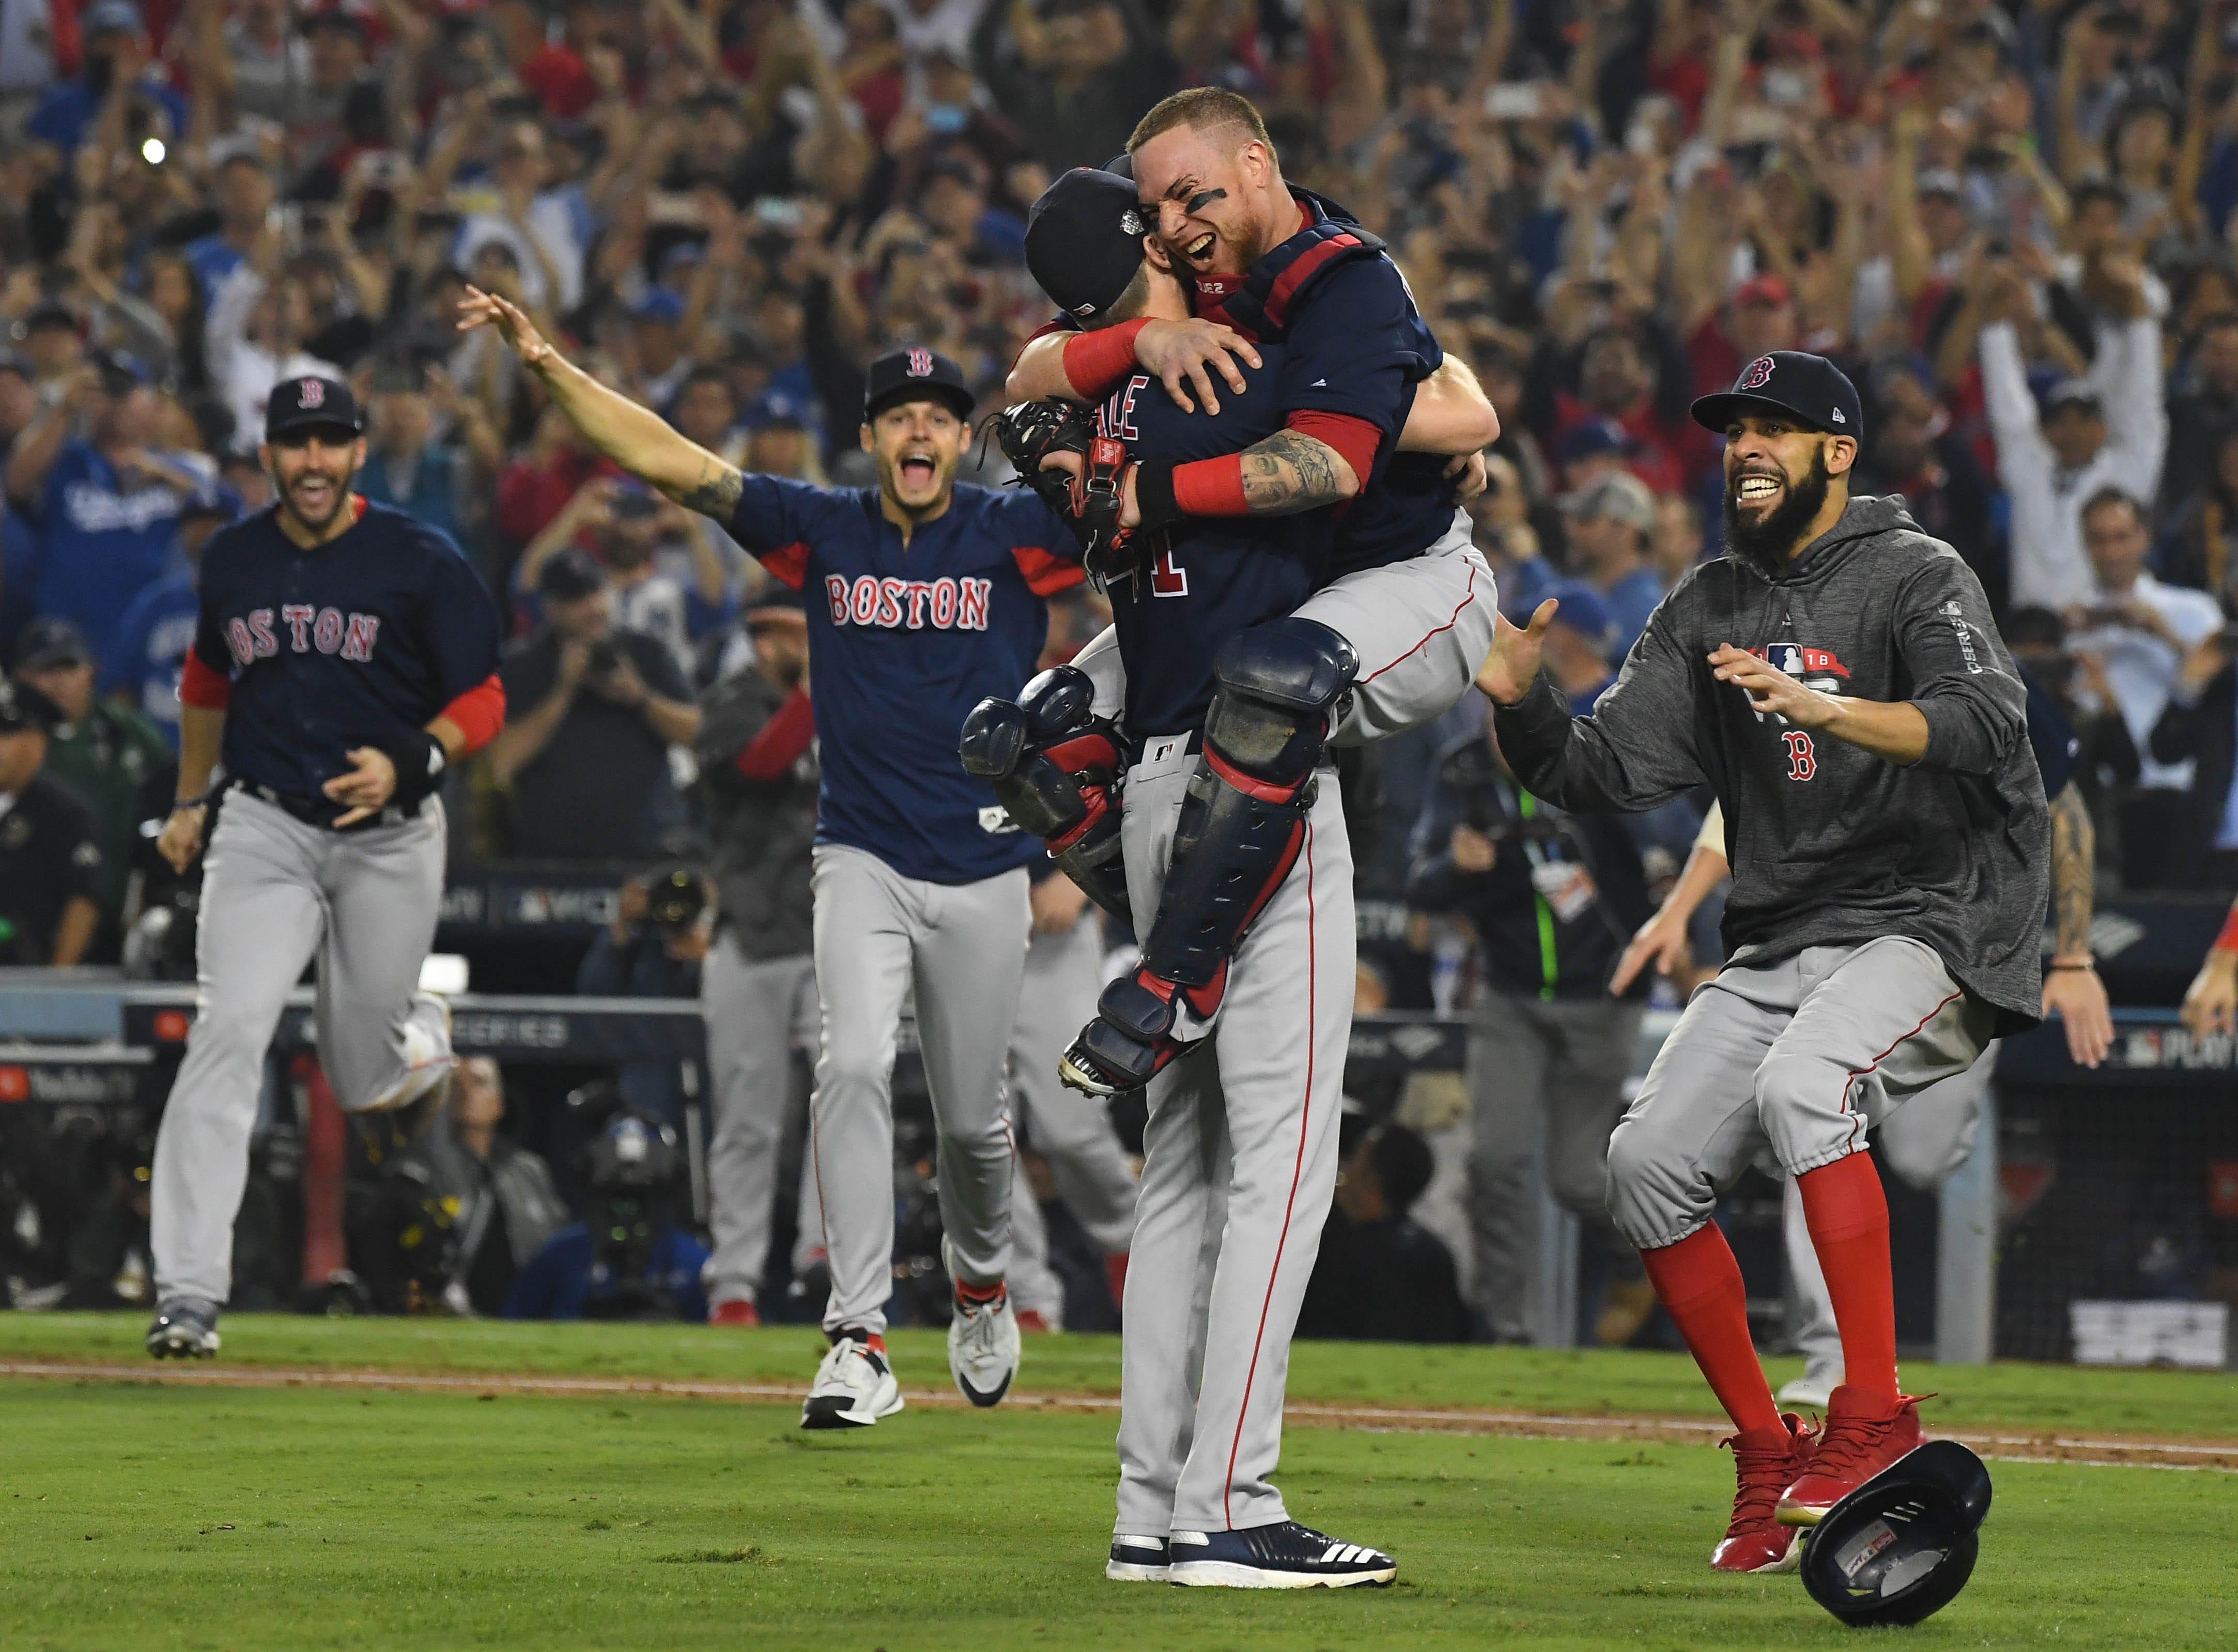 Game 5 at Dodger Stadium: Chris Sale celebrates with catcher Christian Vazquez.